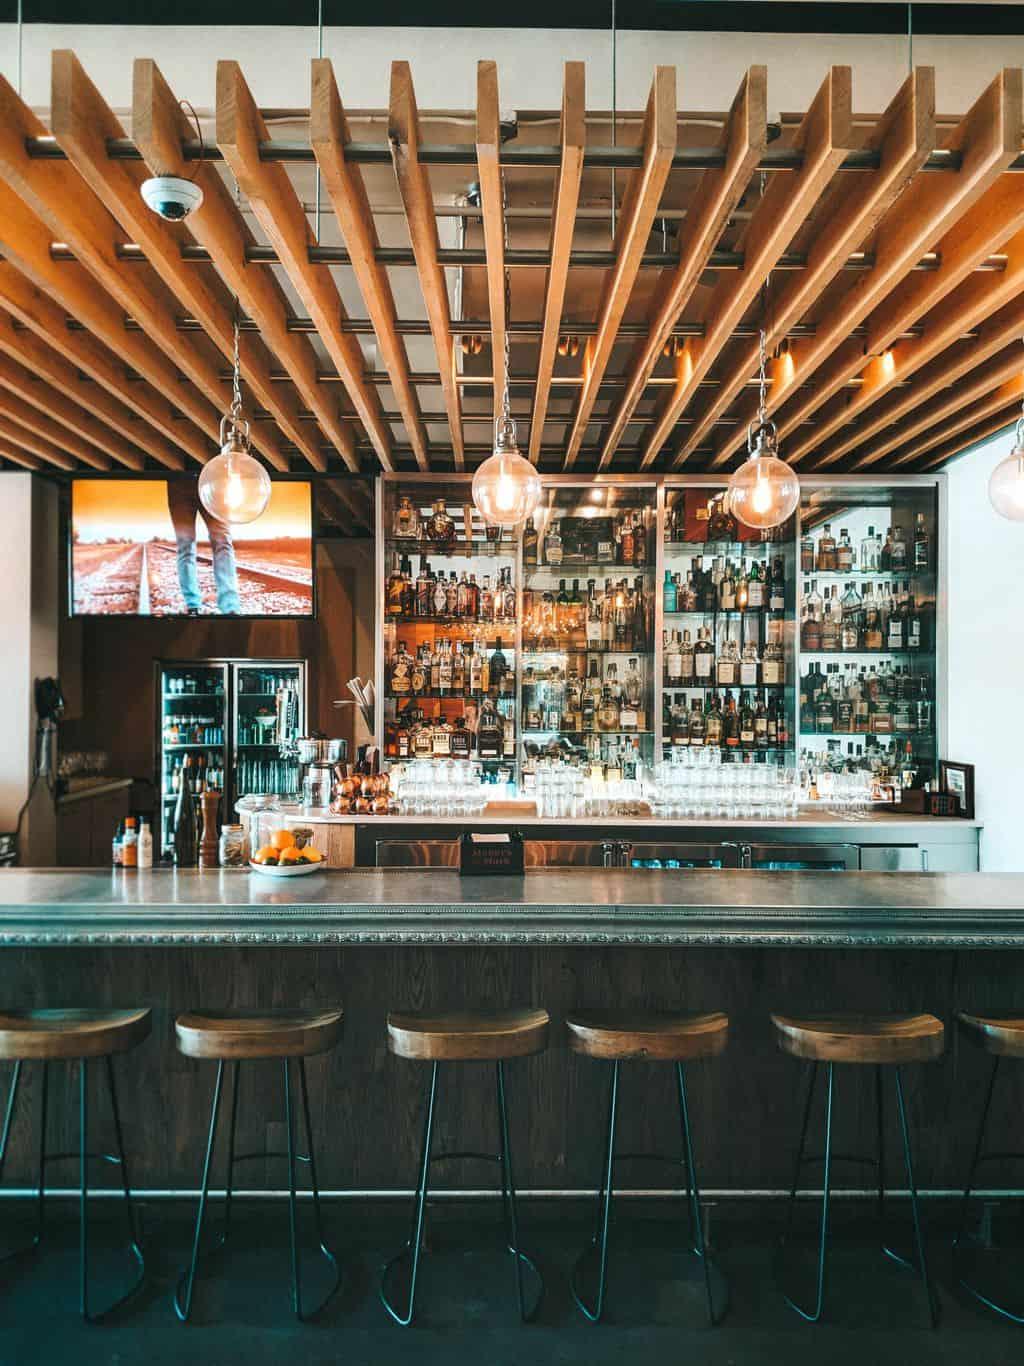 The Epicurean Hotel Bar Tampa Florida SoHo Tampa restaurants